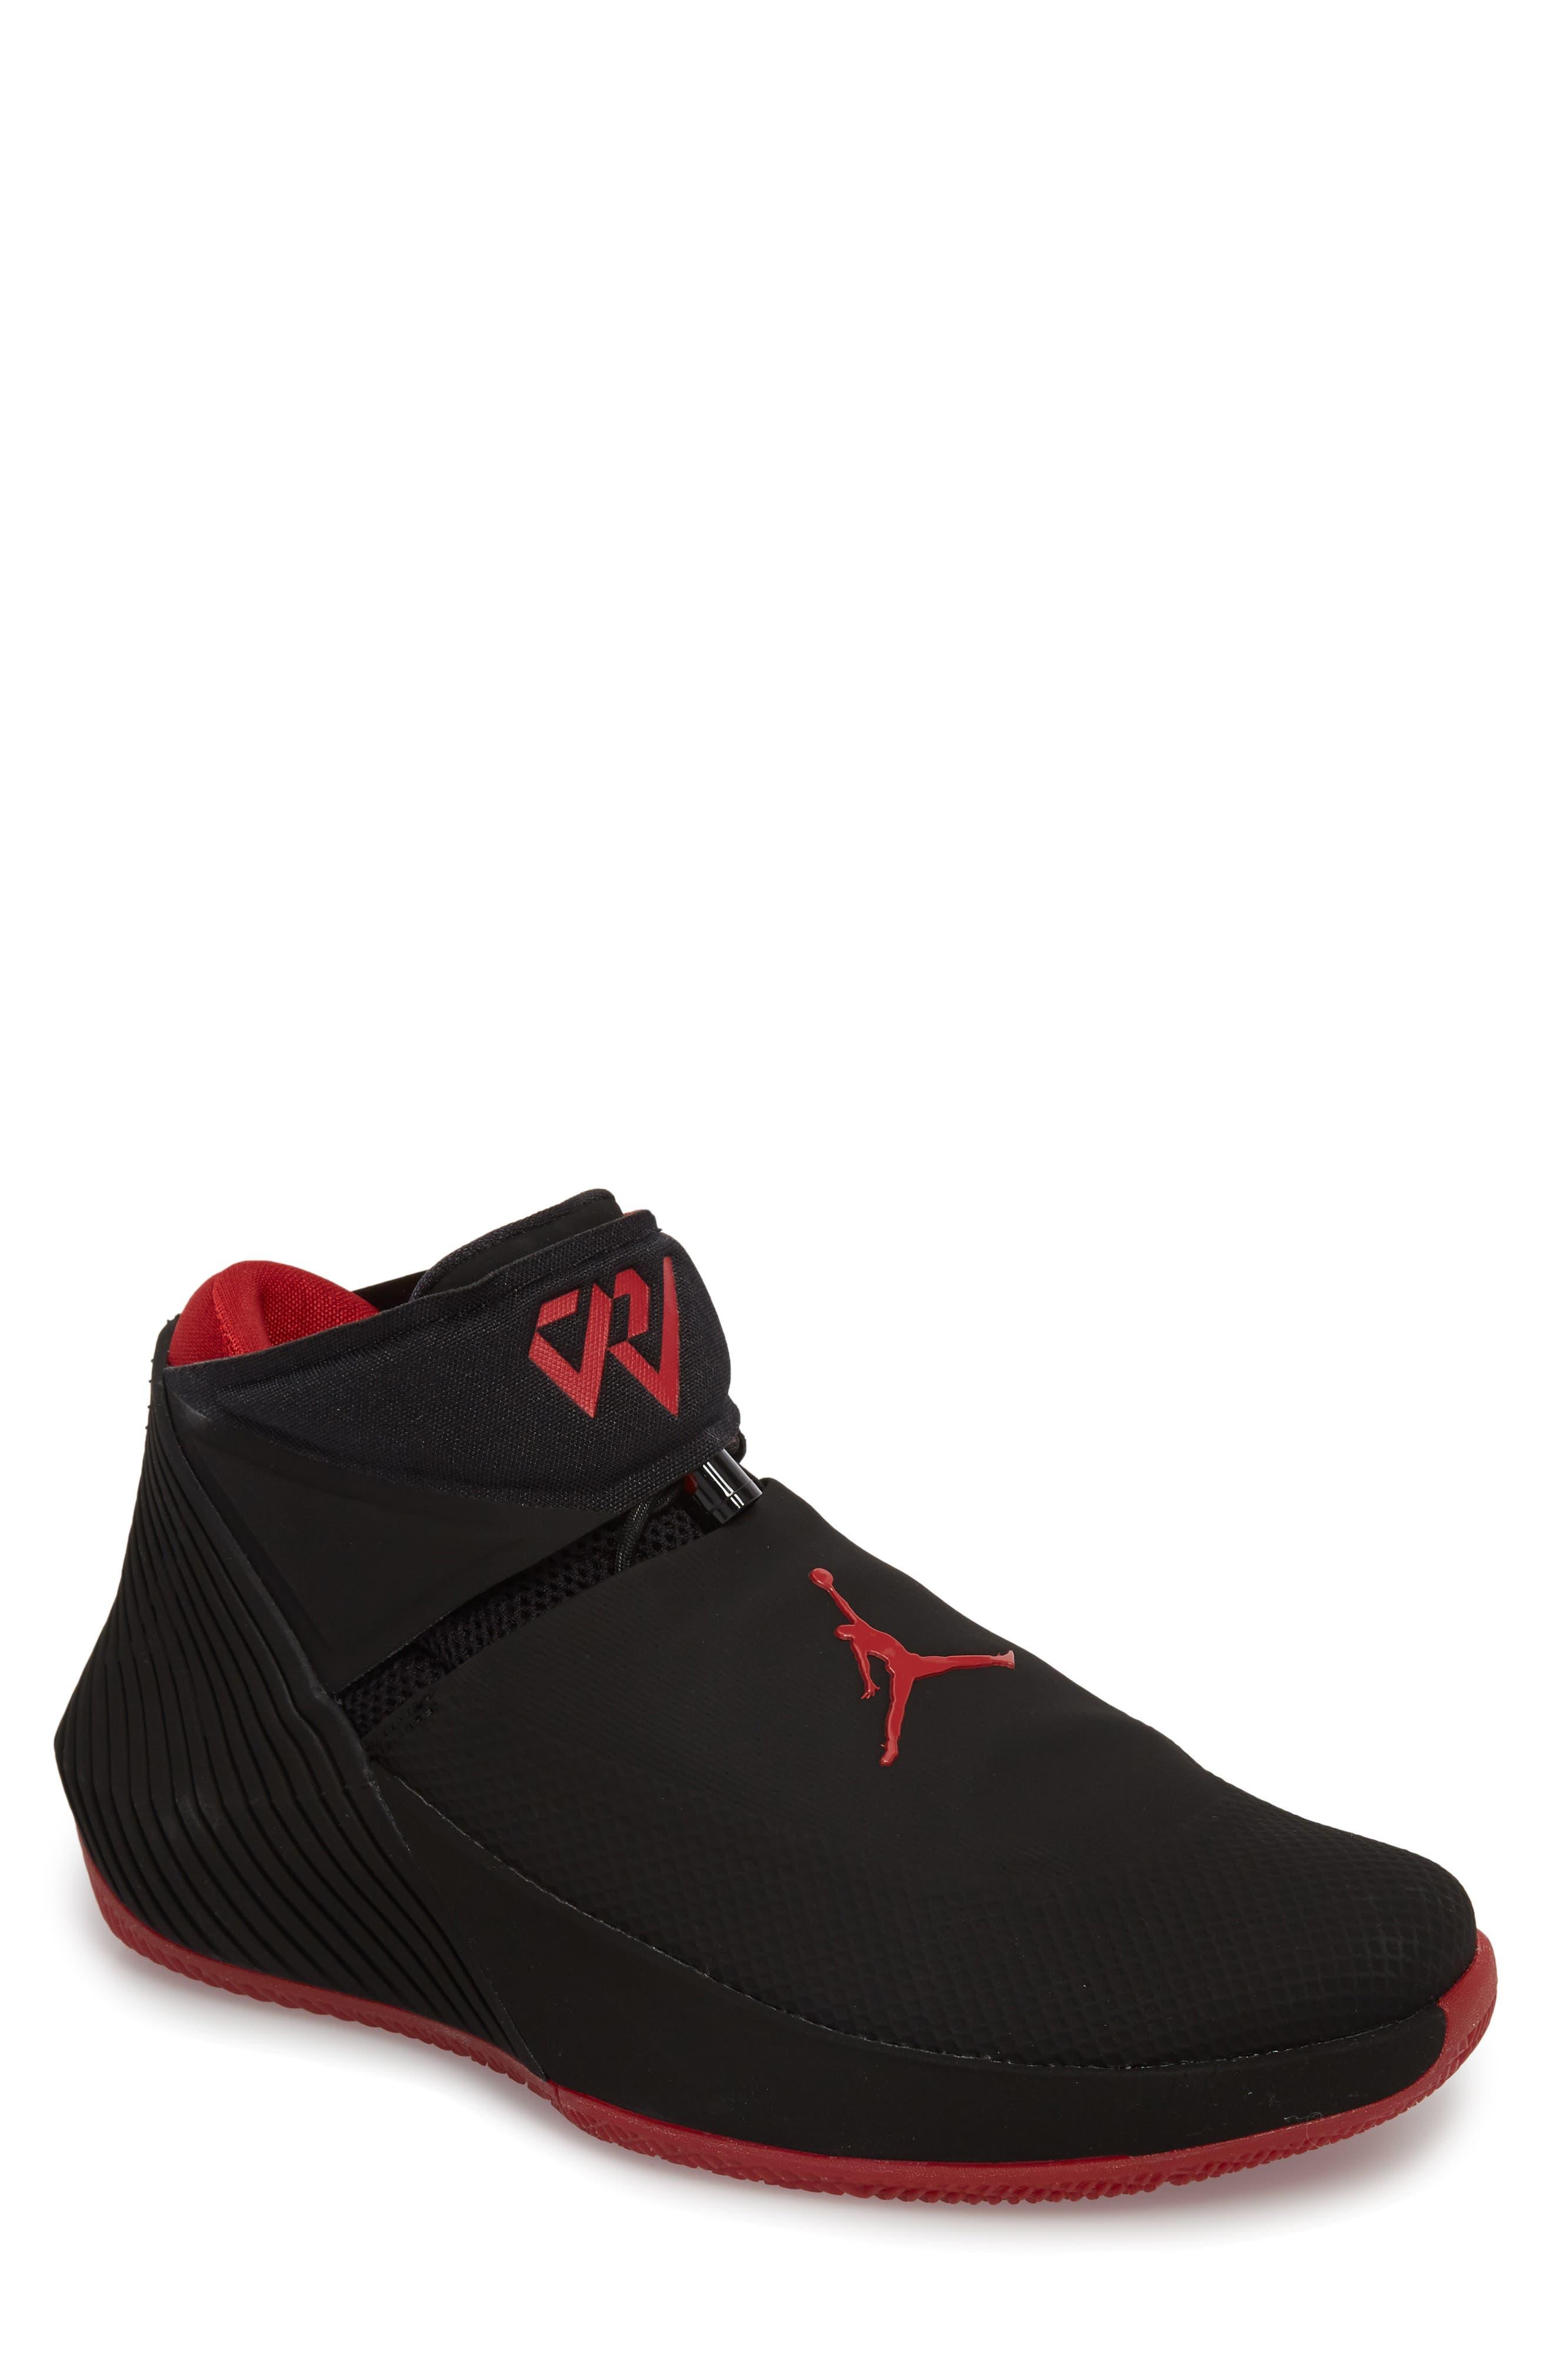 Jordan 'Why Not?' Zero.1 Basketball Shoe,                         Main,                         color, Black/ Hyper Royal